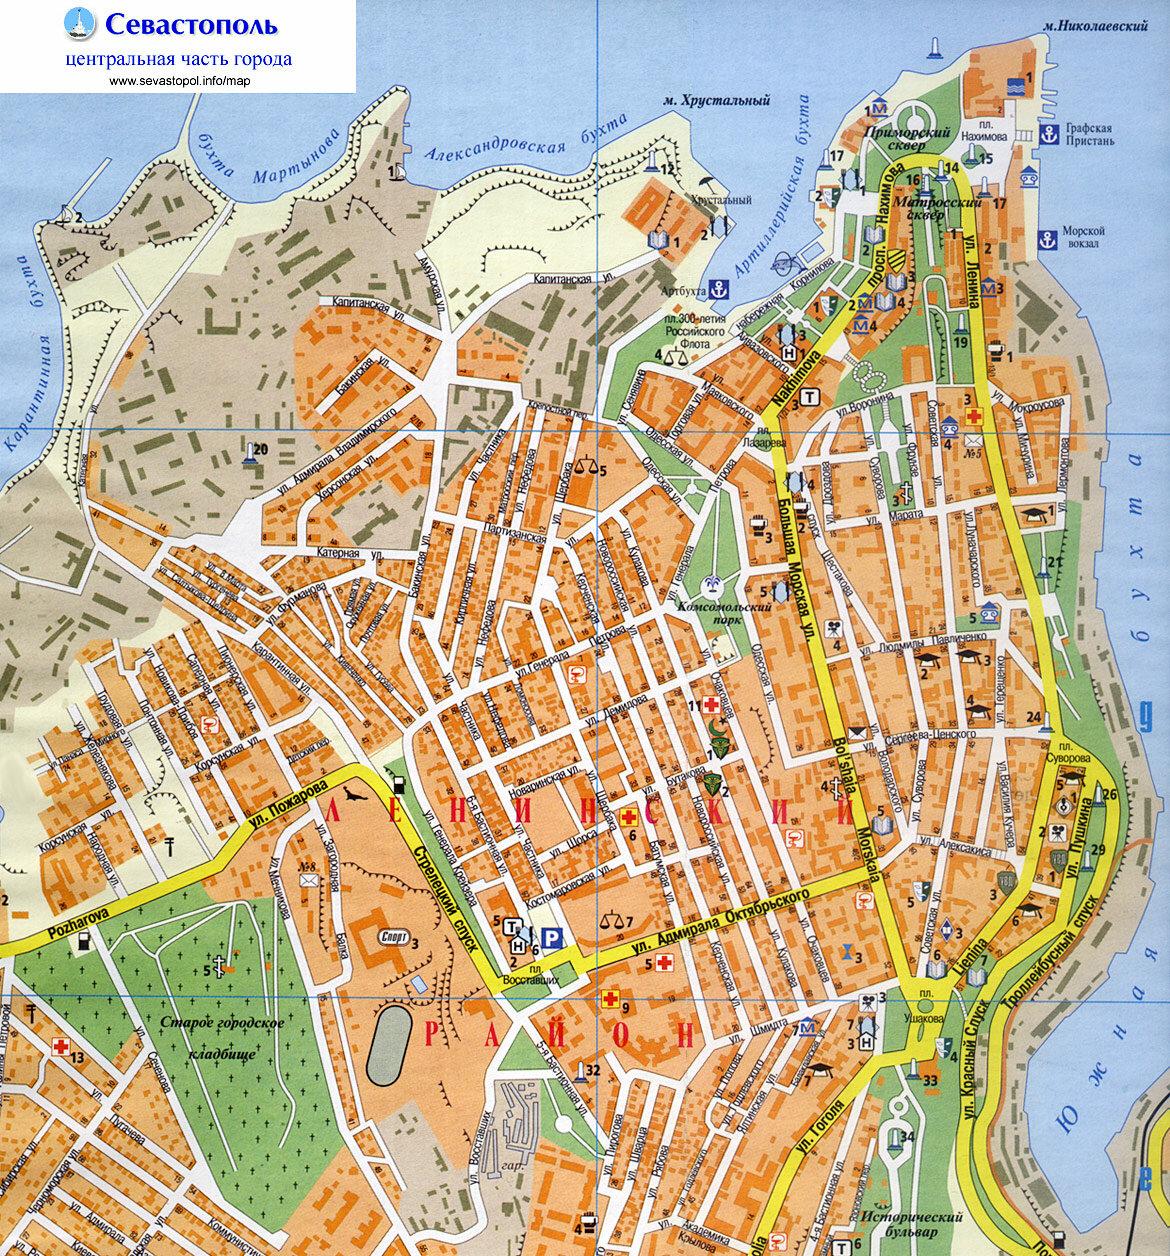 севастополь на карте картинки